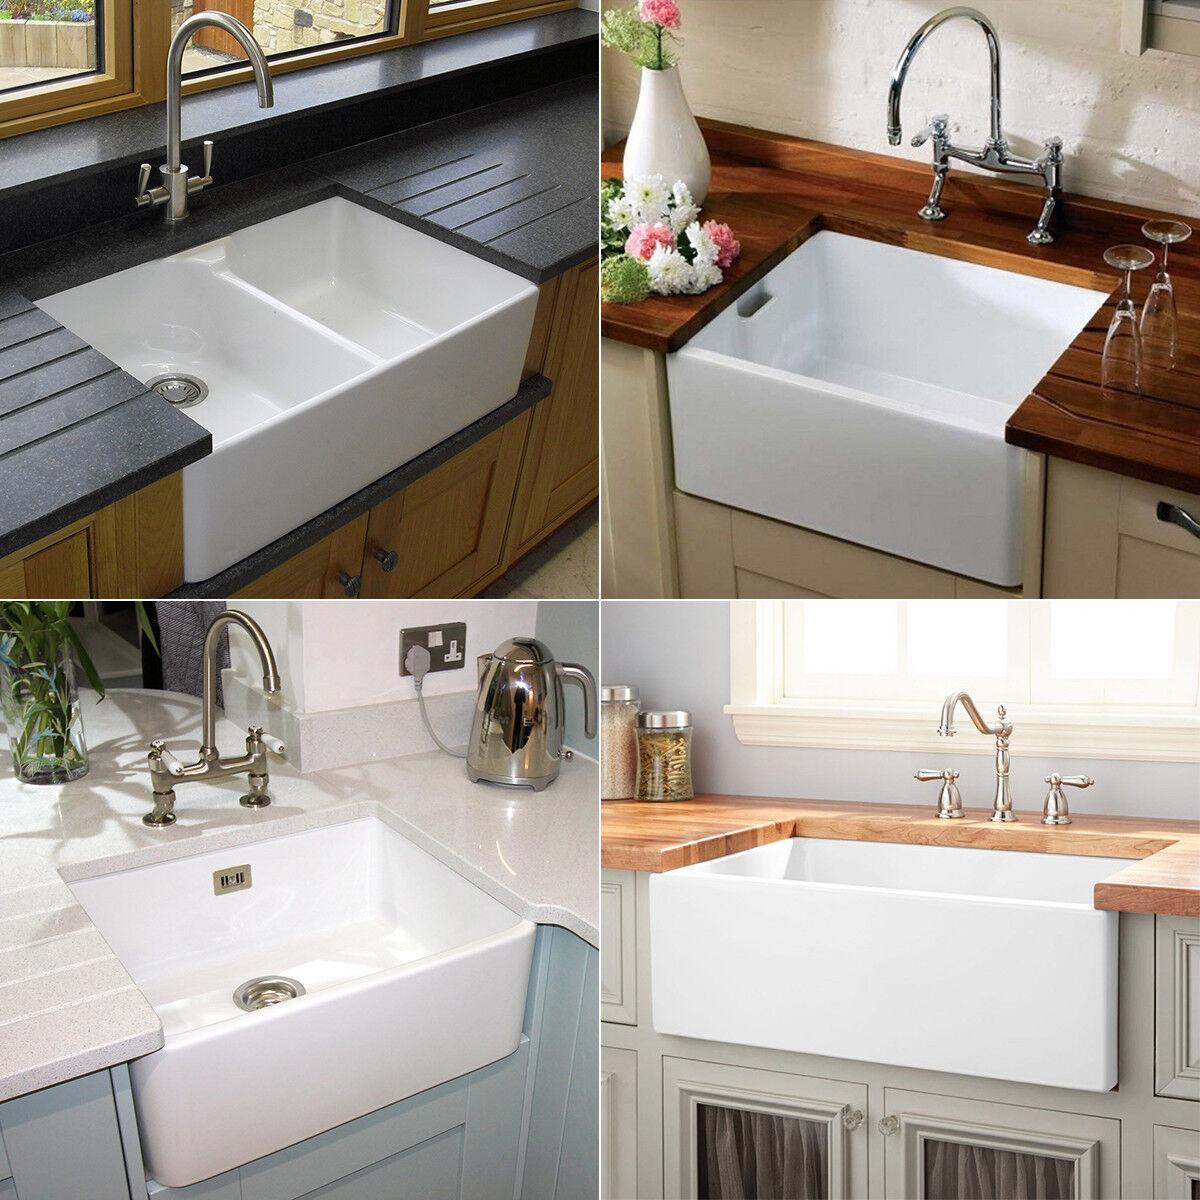 Rak Gloss White Farmhouse Belfast Butler Ceramic Kitchen Sink Tap Various Style Ebay